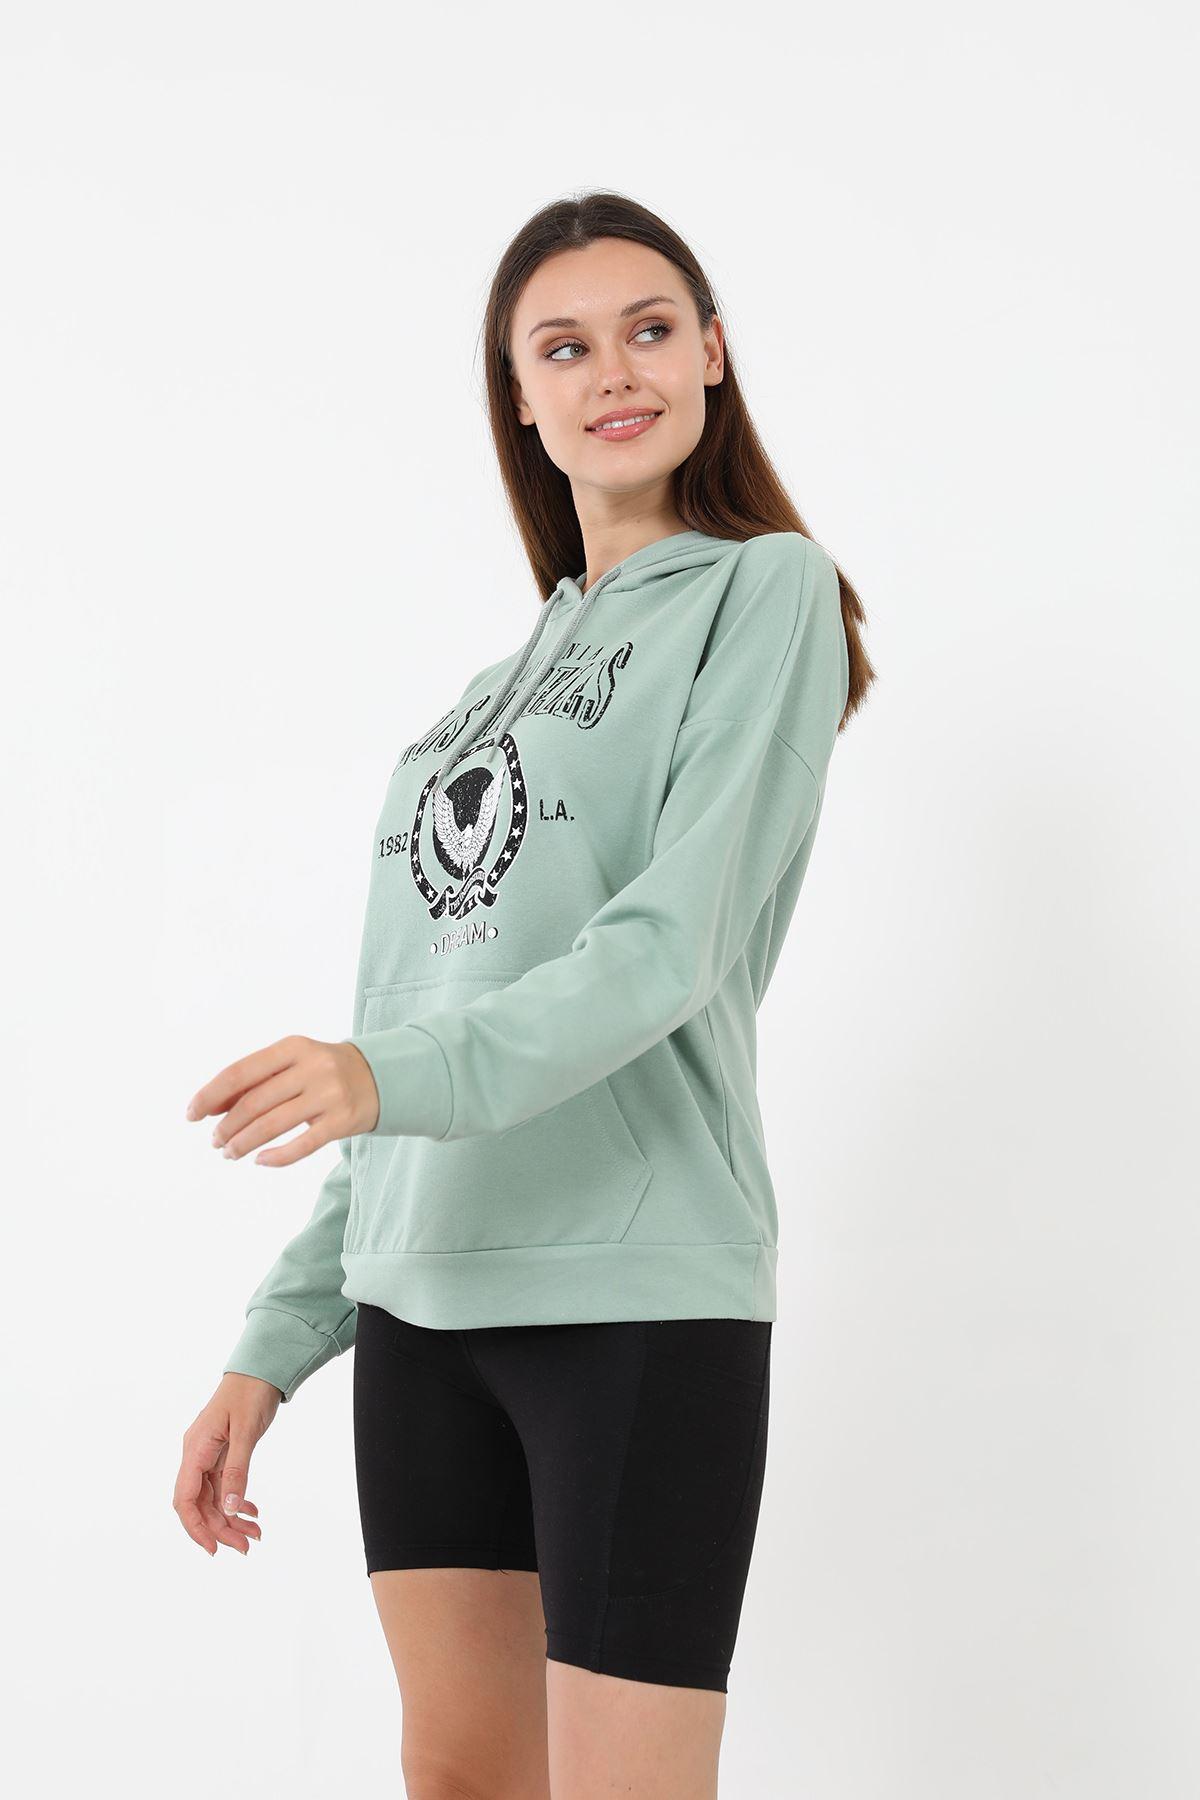 Los Angeles Sweatshirt-Mint